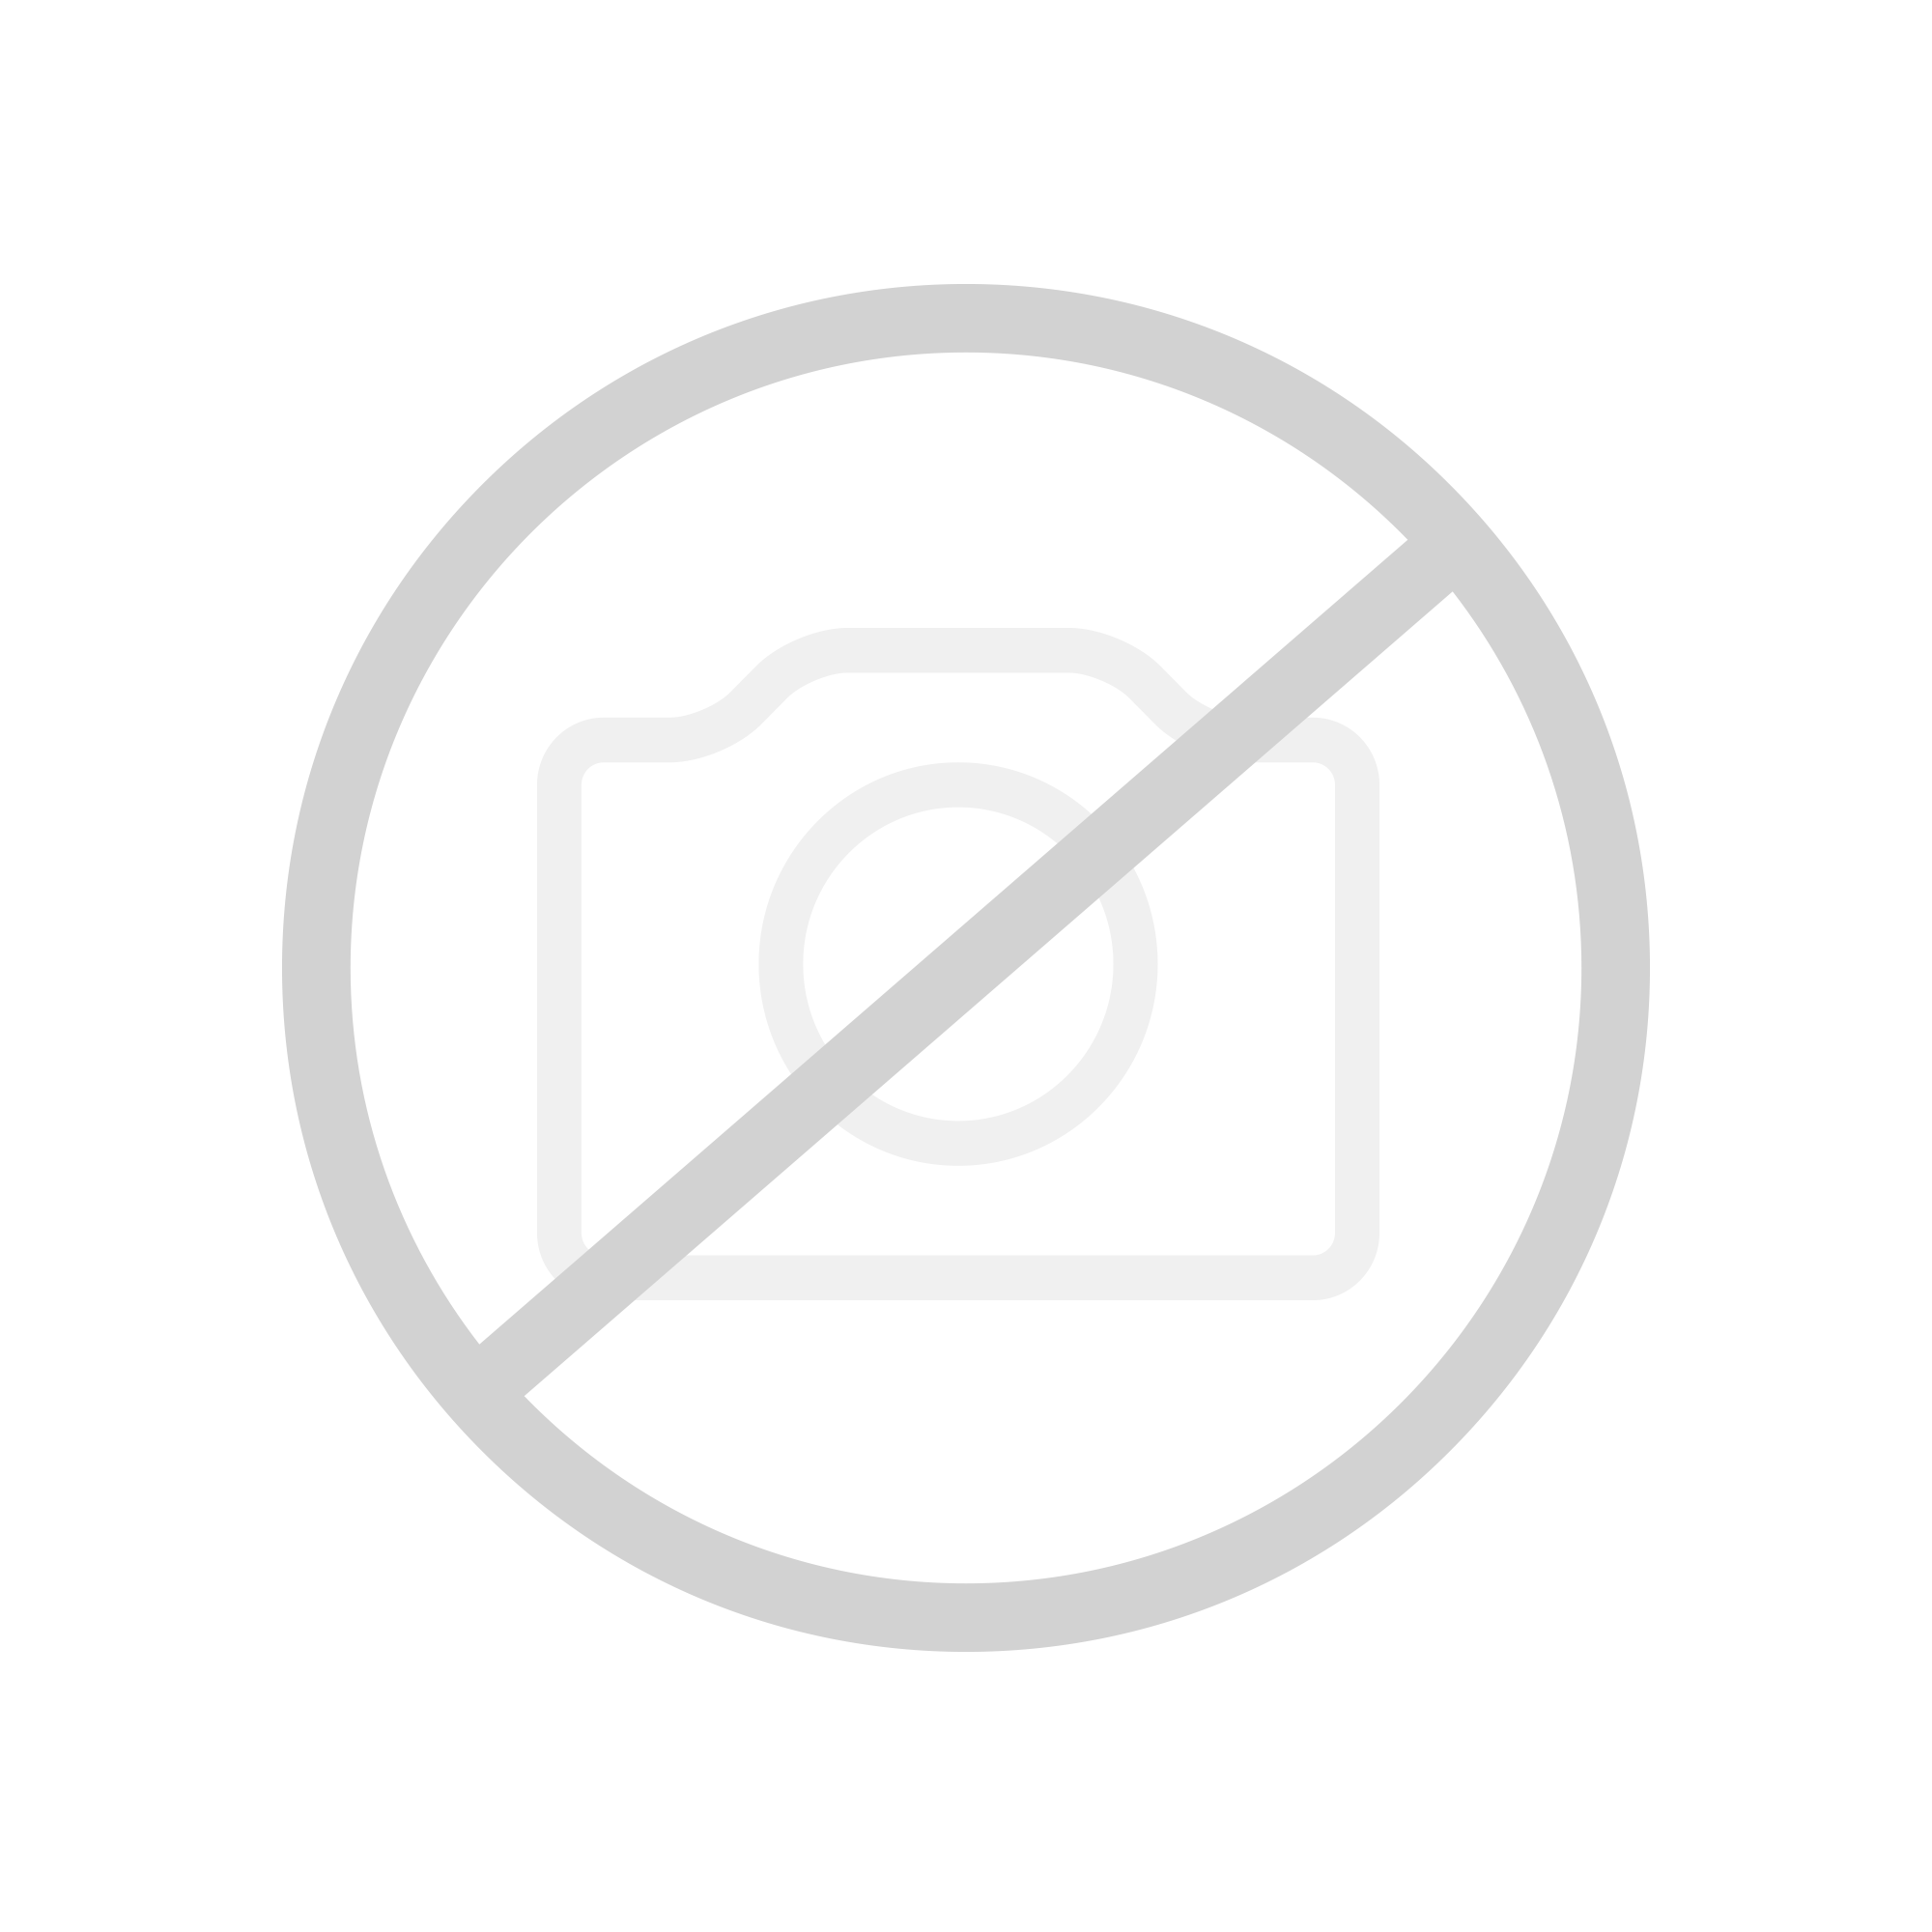 Bette Ablaufgarnitur, senkrechte Entwässerung, 0,6 l/s Komplett-Set graphit